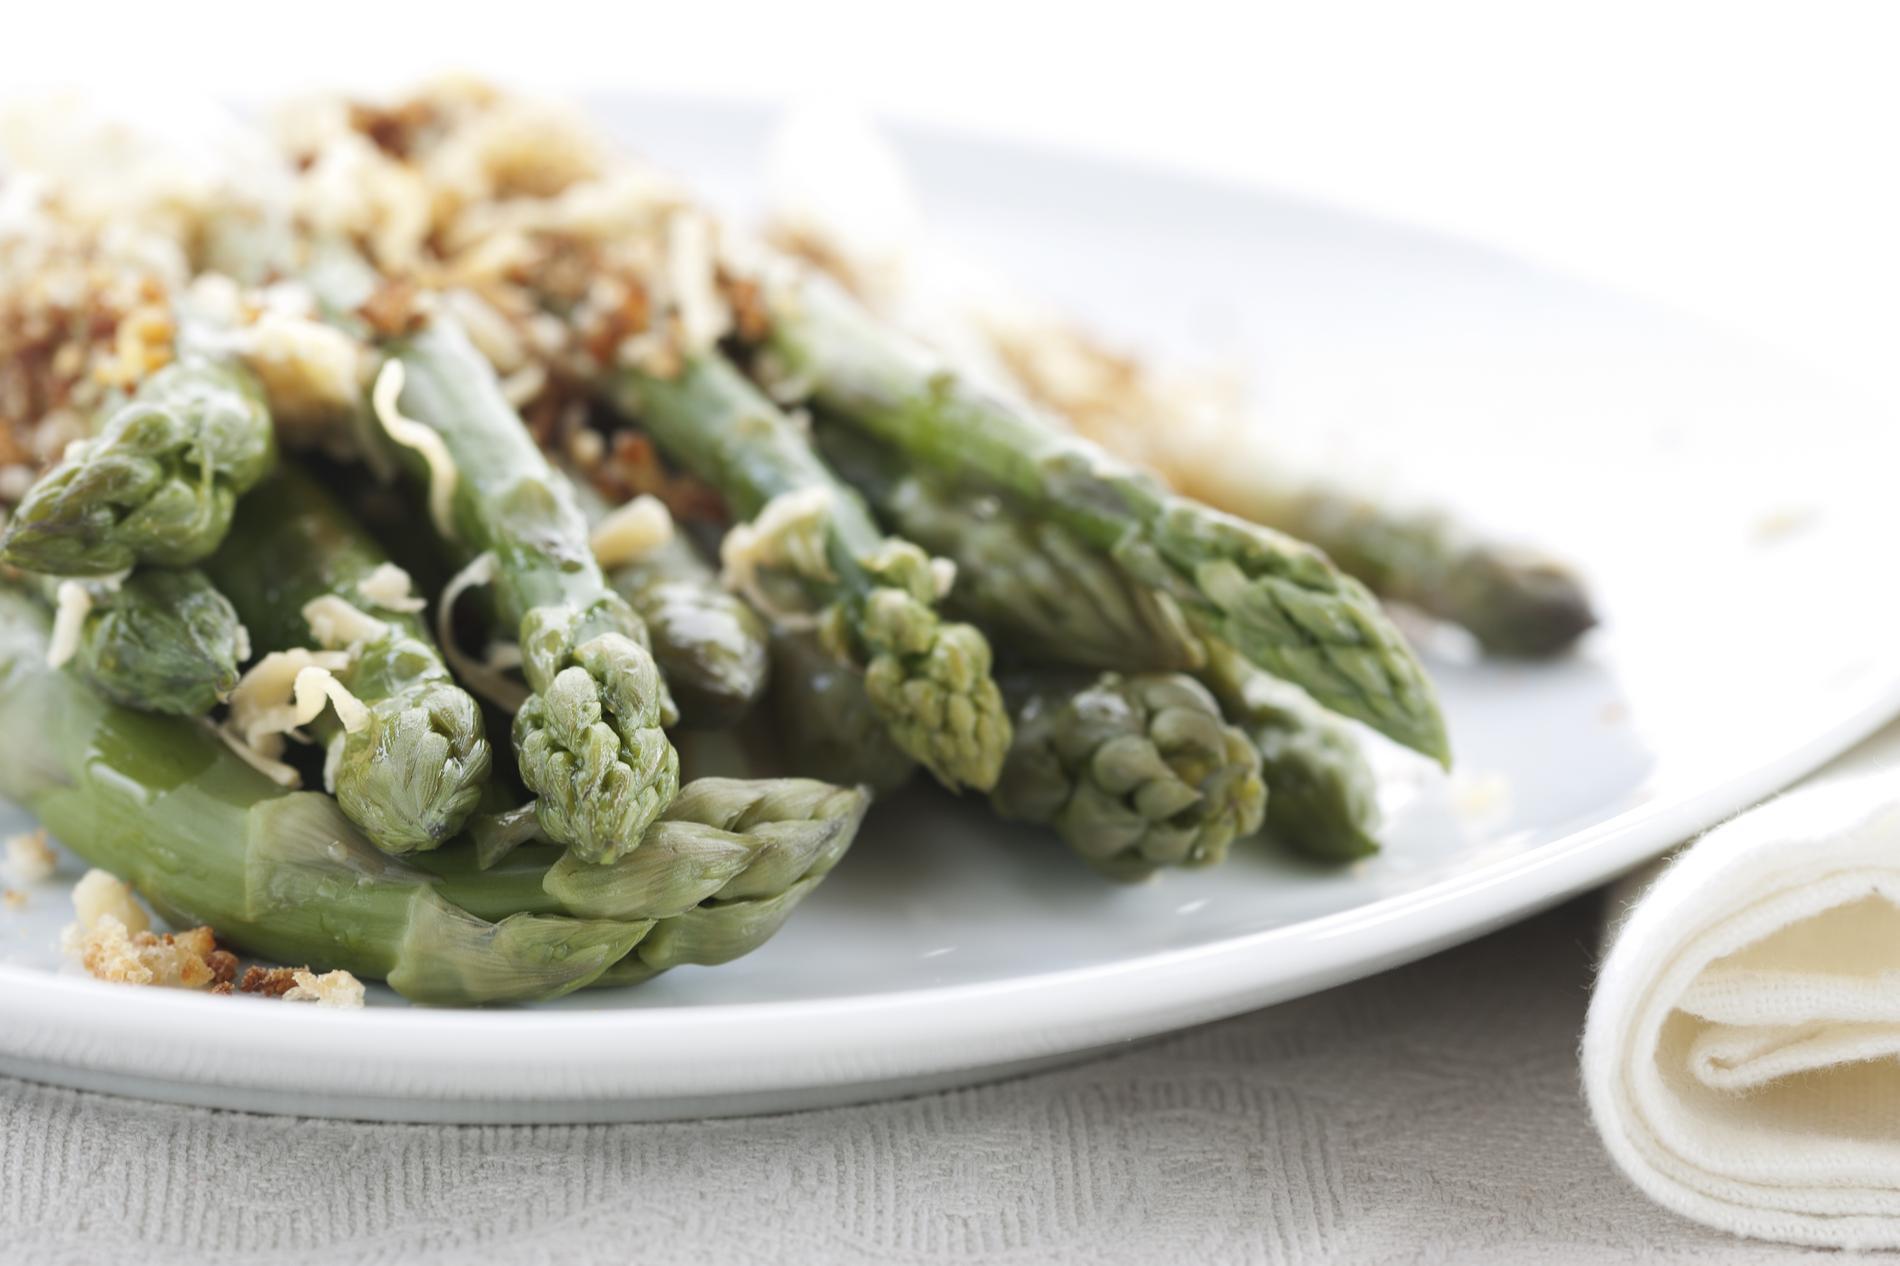 nos plus belles recettes base d 39 asperges vertes cuisine. Black Bedroom Furniture Sets. Home Design Ideas